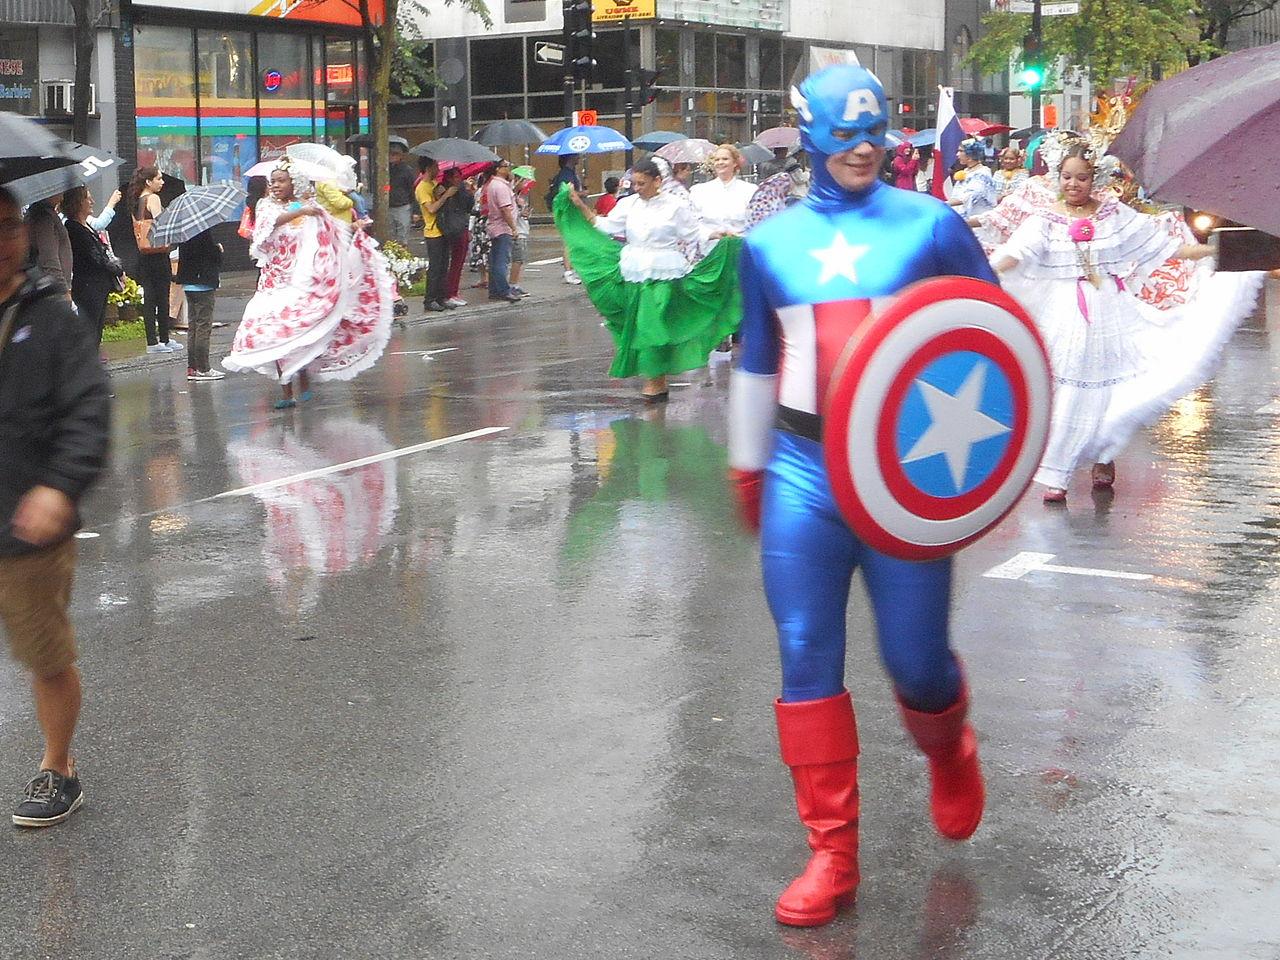 File:Canada Day 2015 on Saint Catherine Street - 306a.jpg - Wikimedia